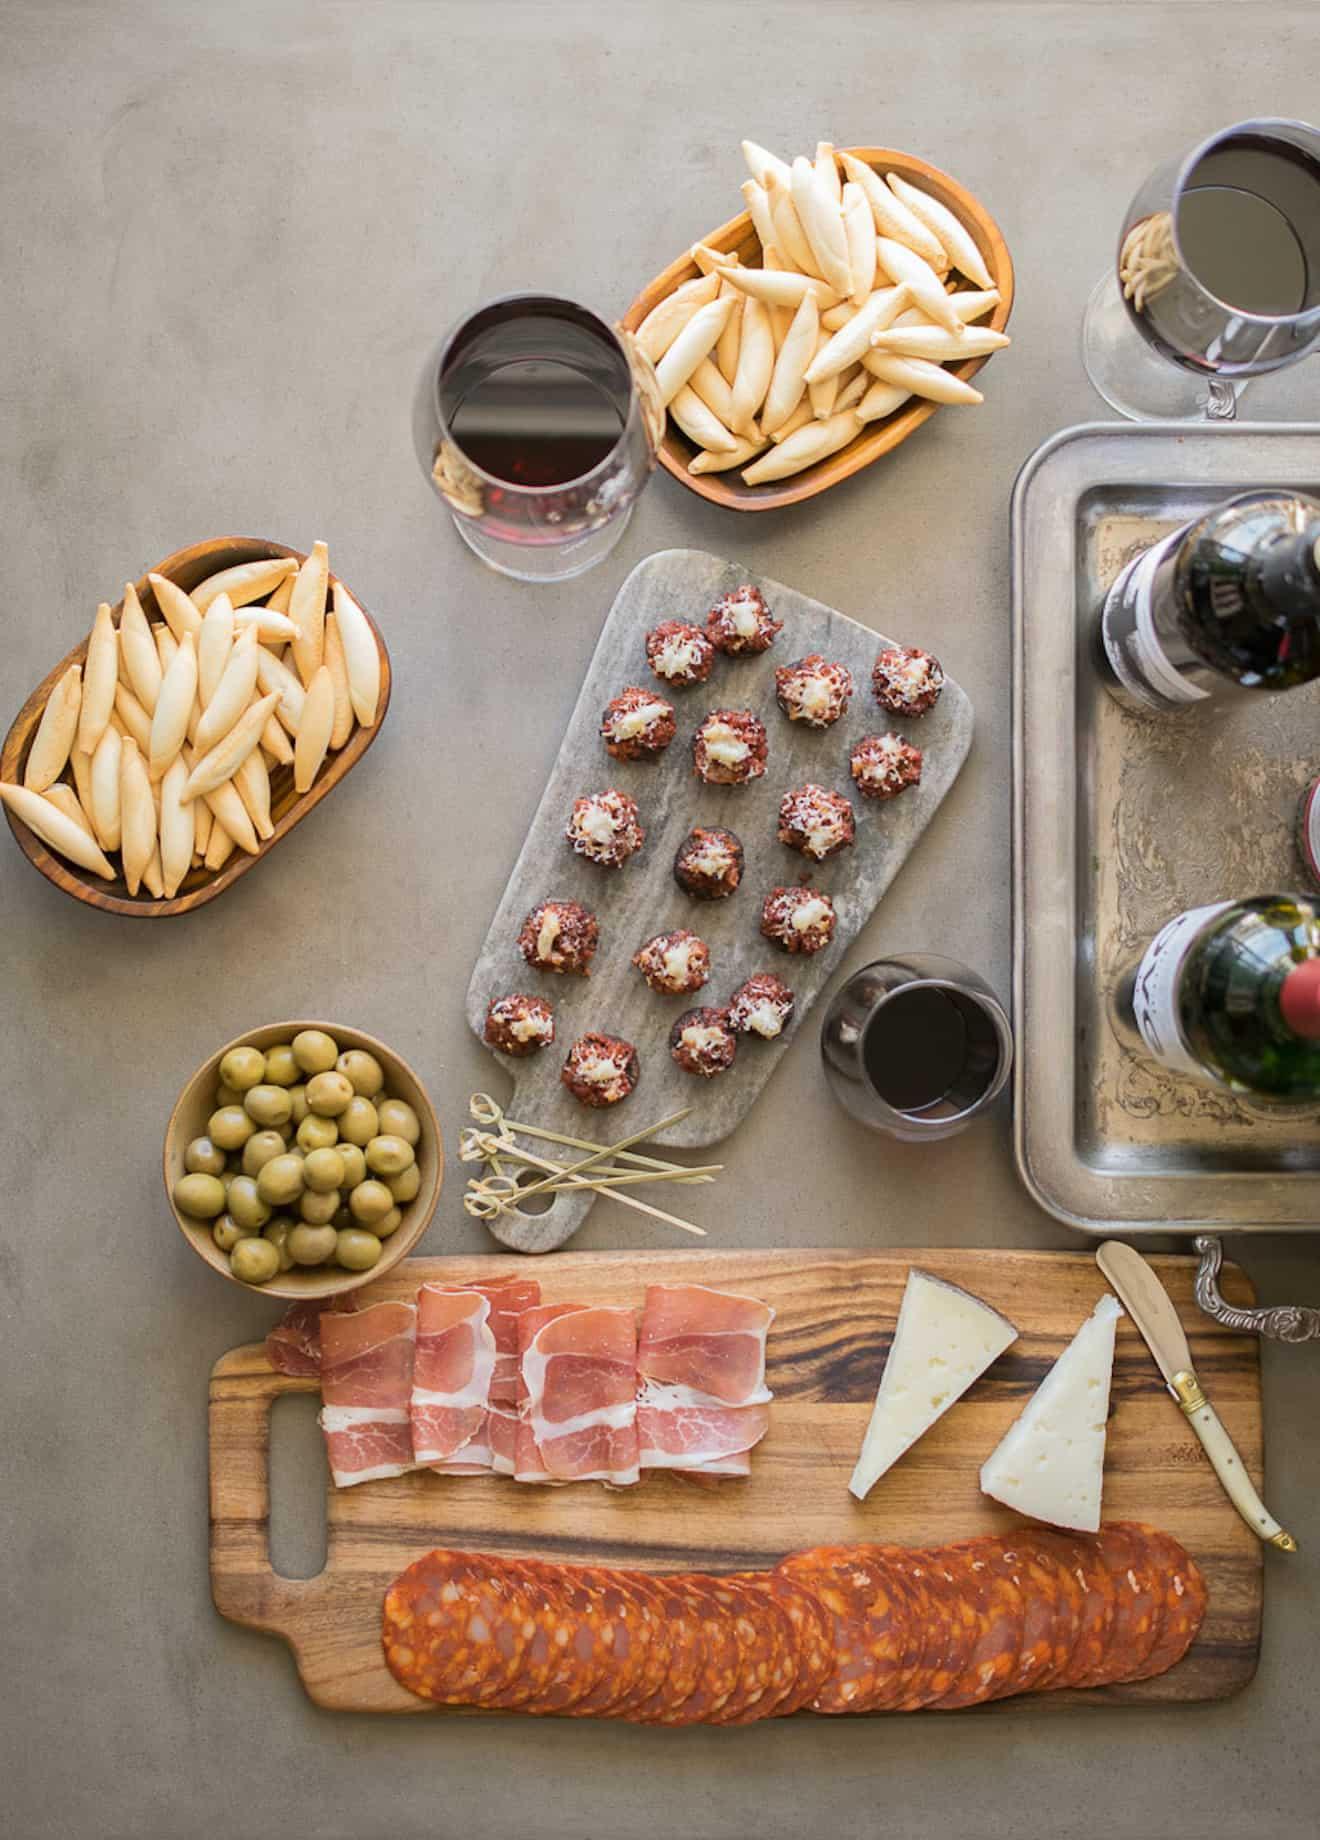 An array of tapas, chorizo stuffed mushrooms, meats, cheeses, crackers and wine